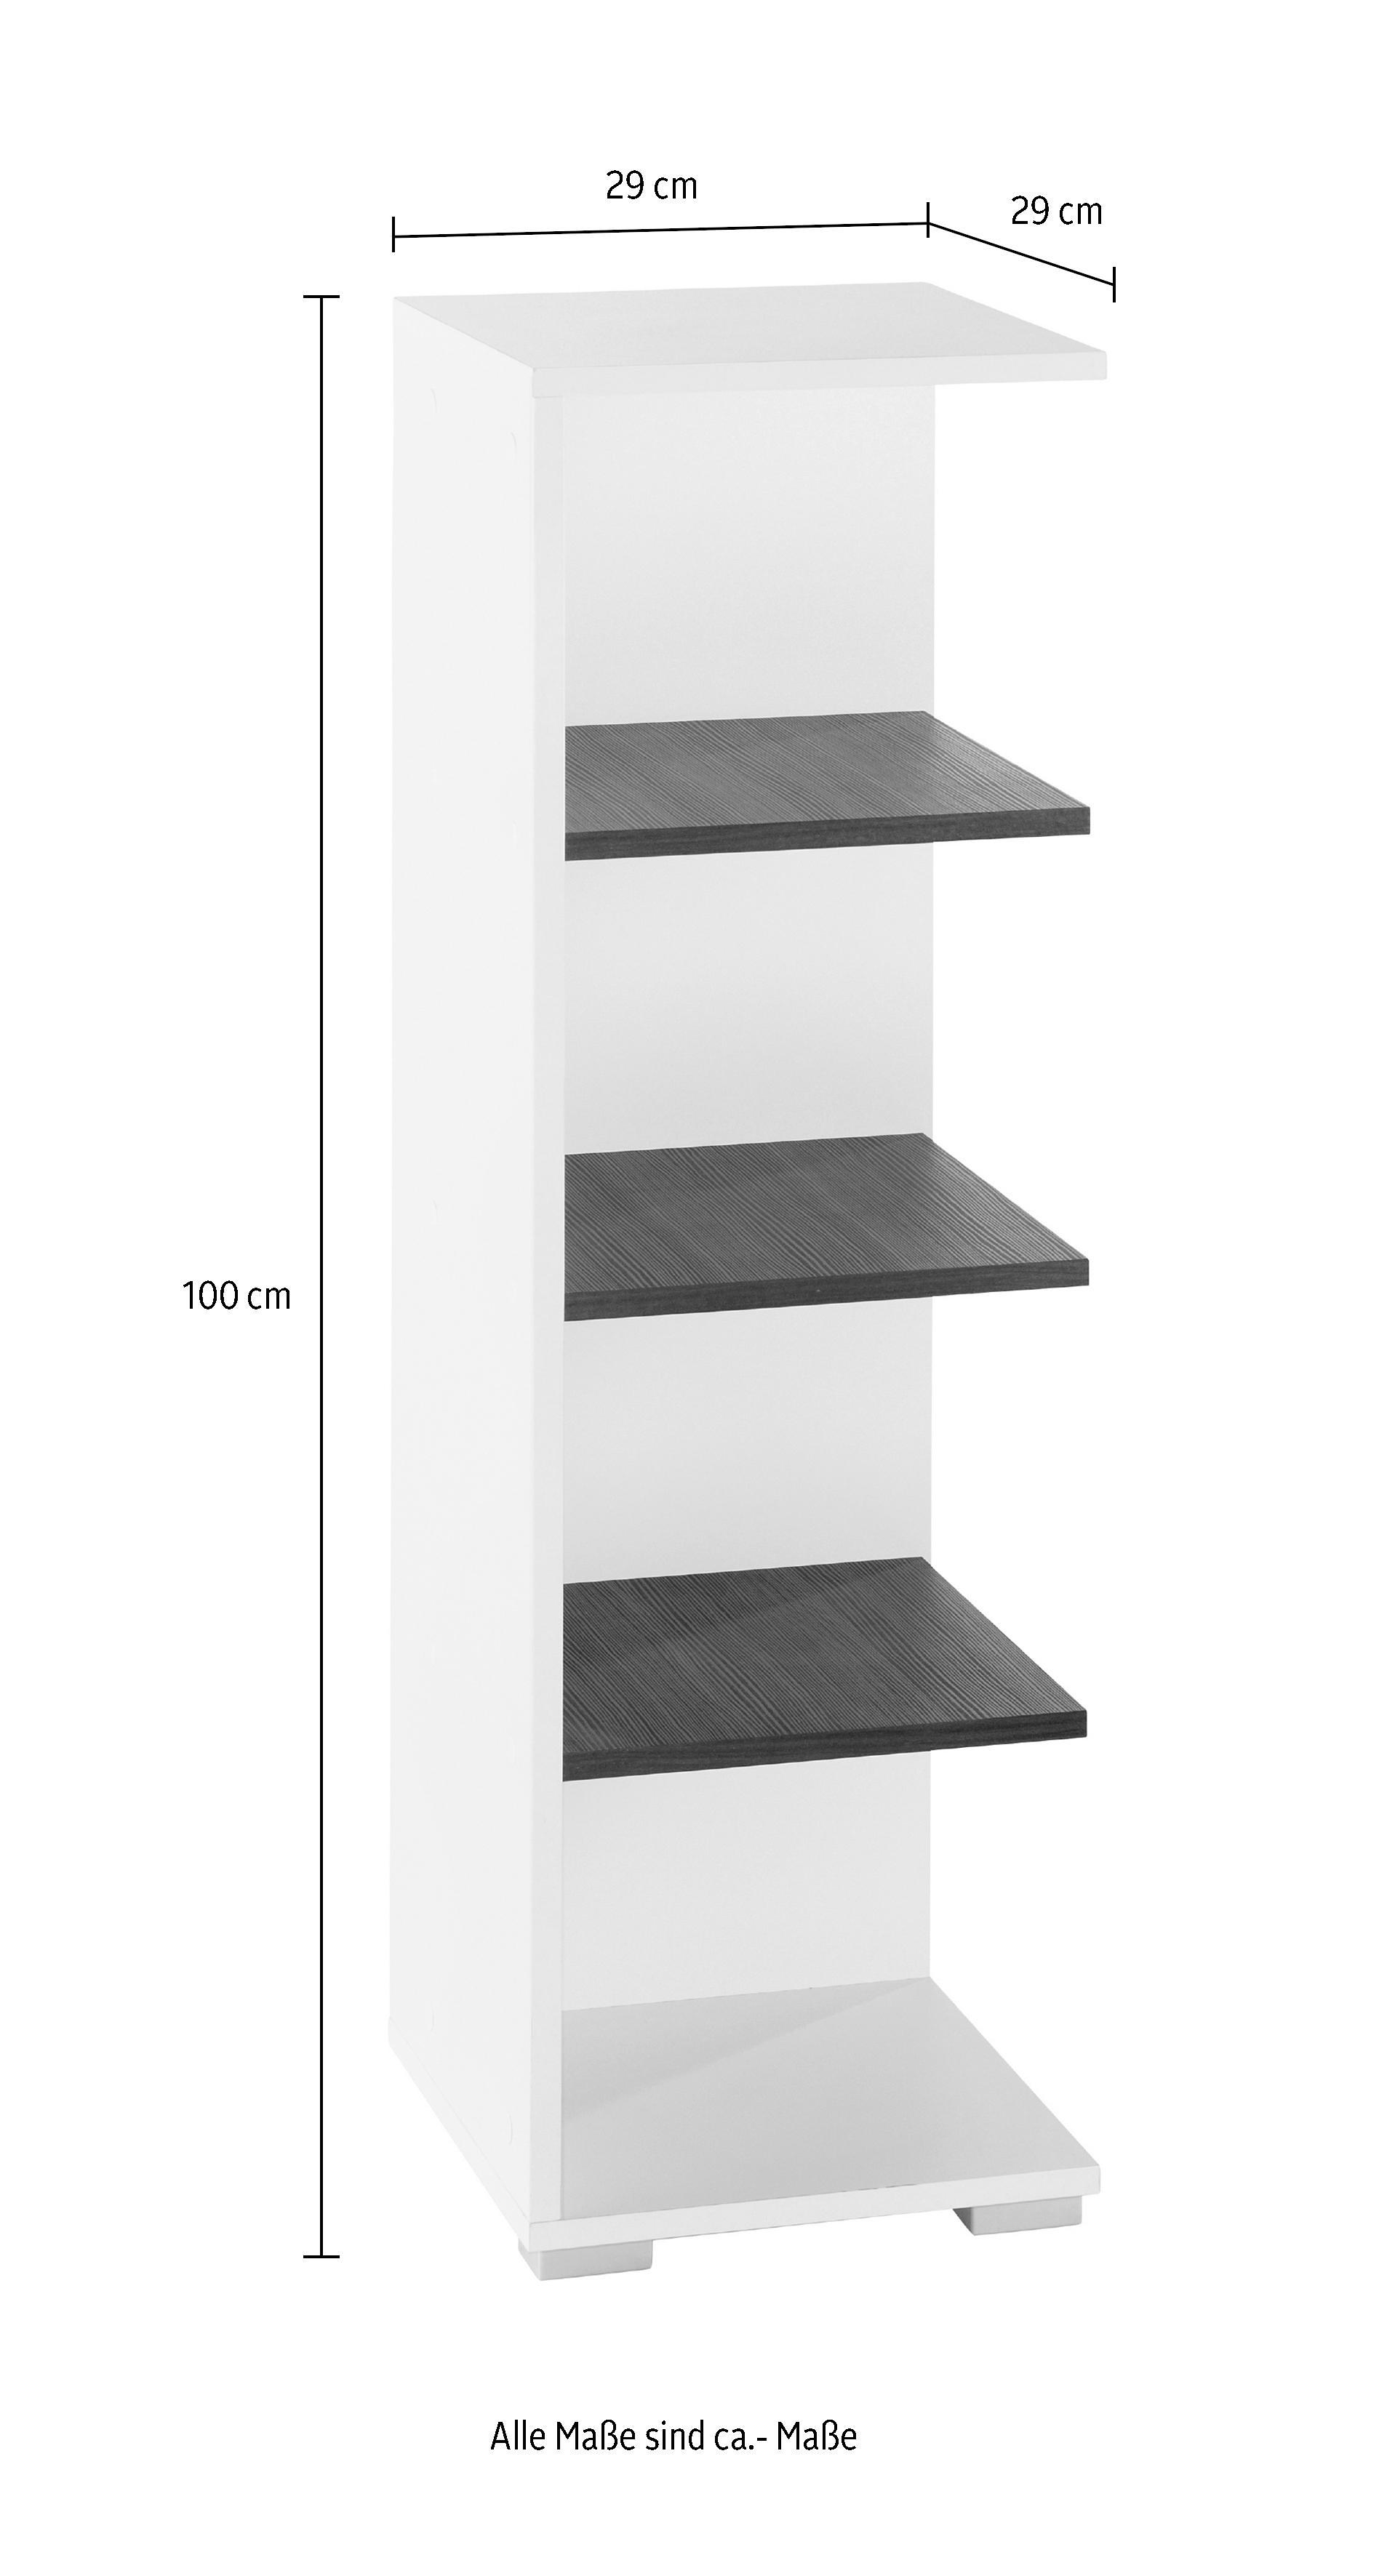 Best Badkamer Hoekrek Ideas - Interior Design Ideas - deltaepsilontau.us